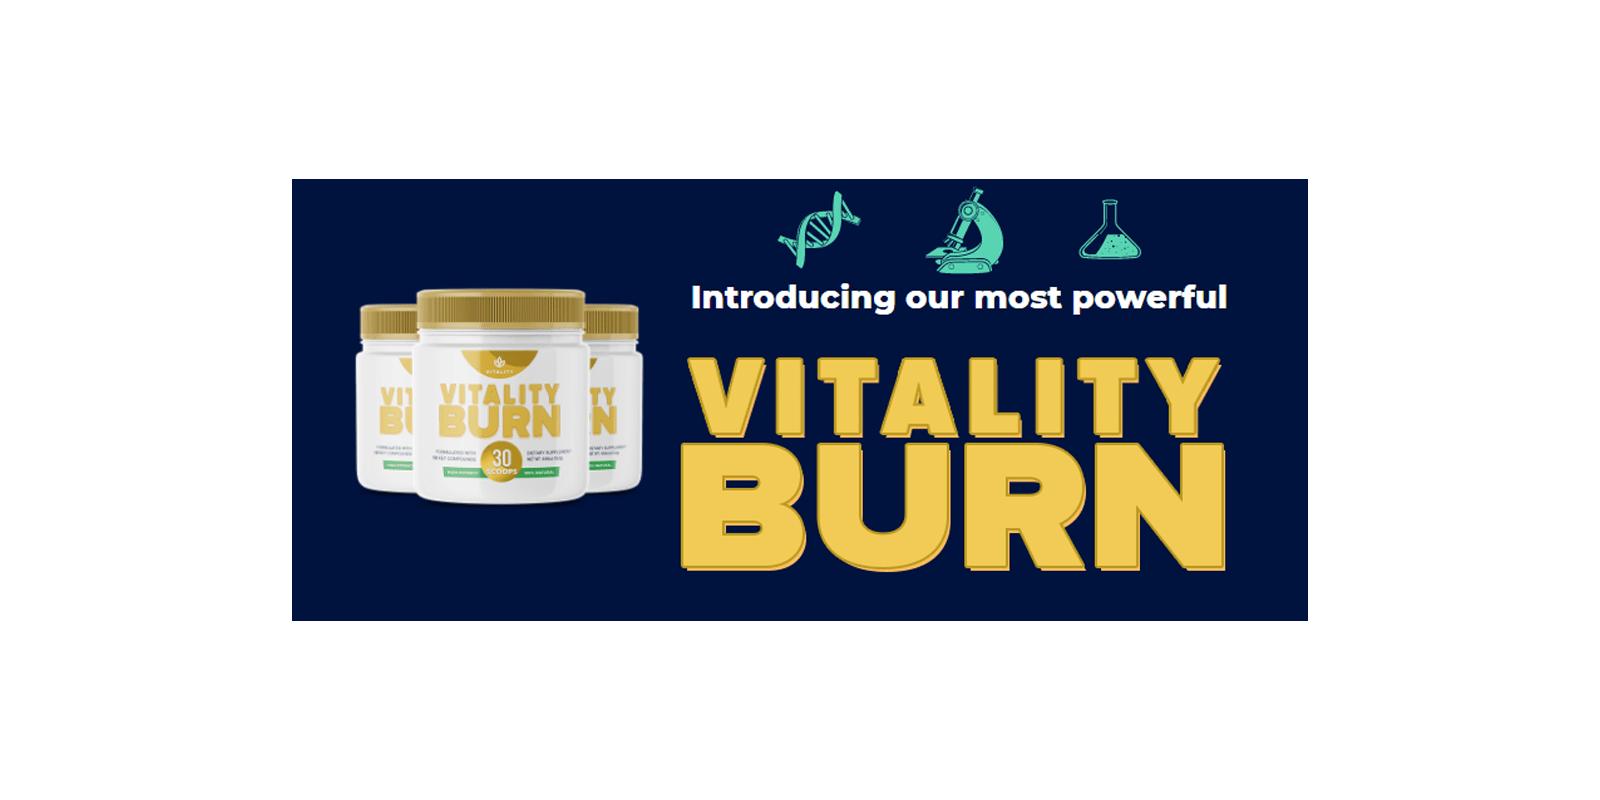 vitality-burn-supplement